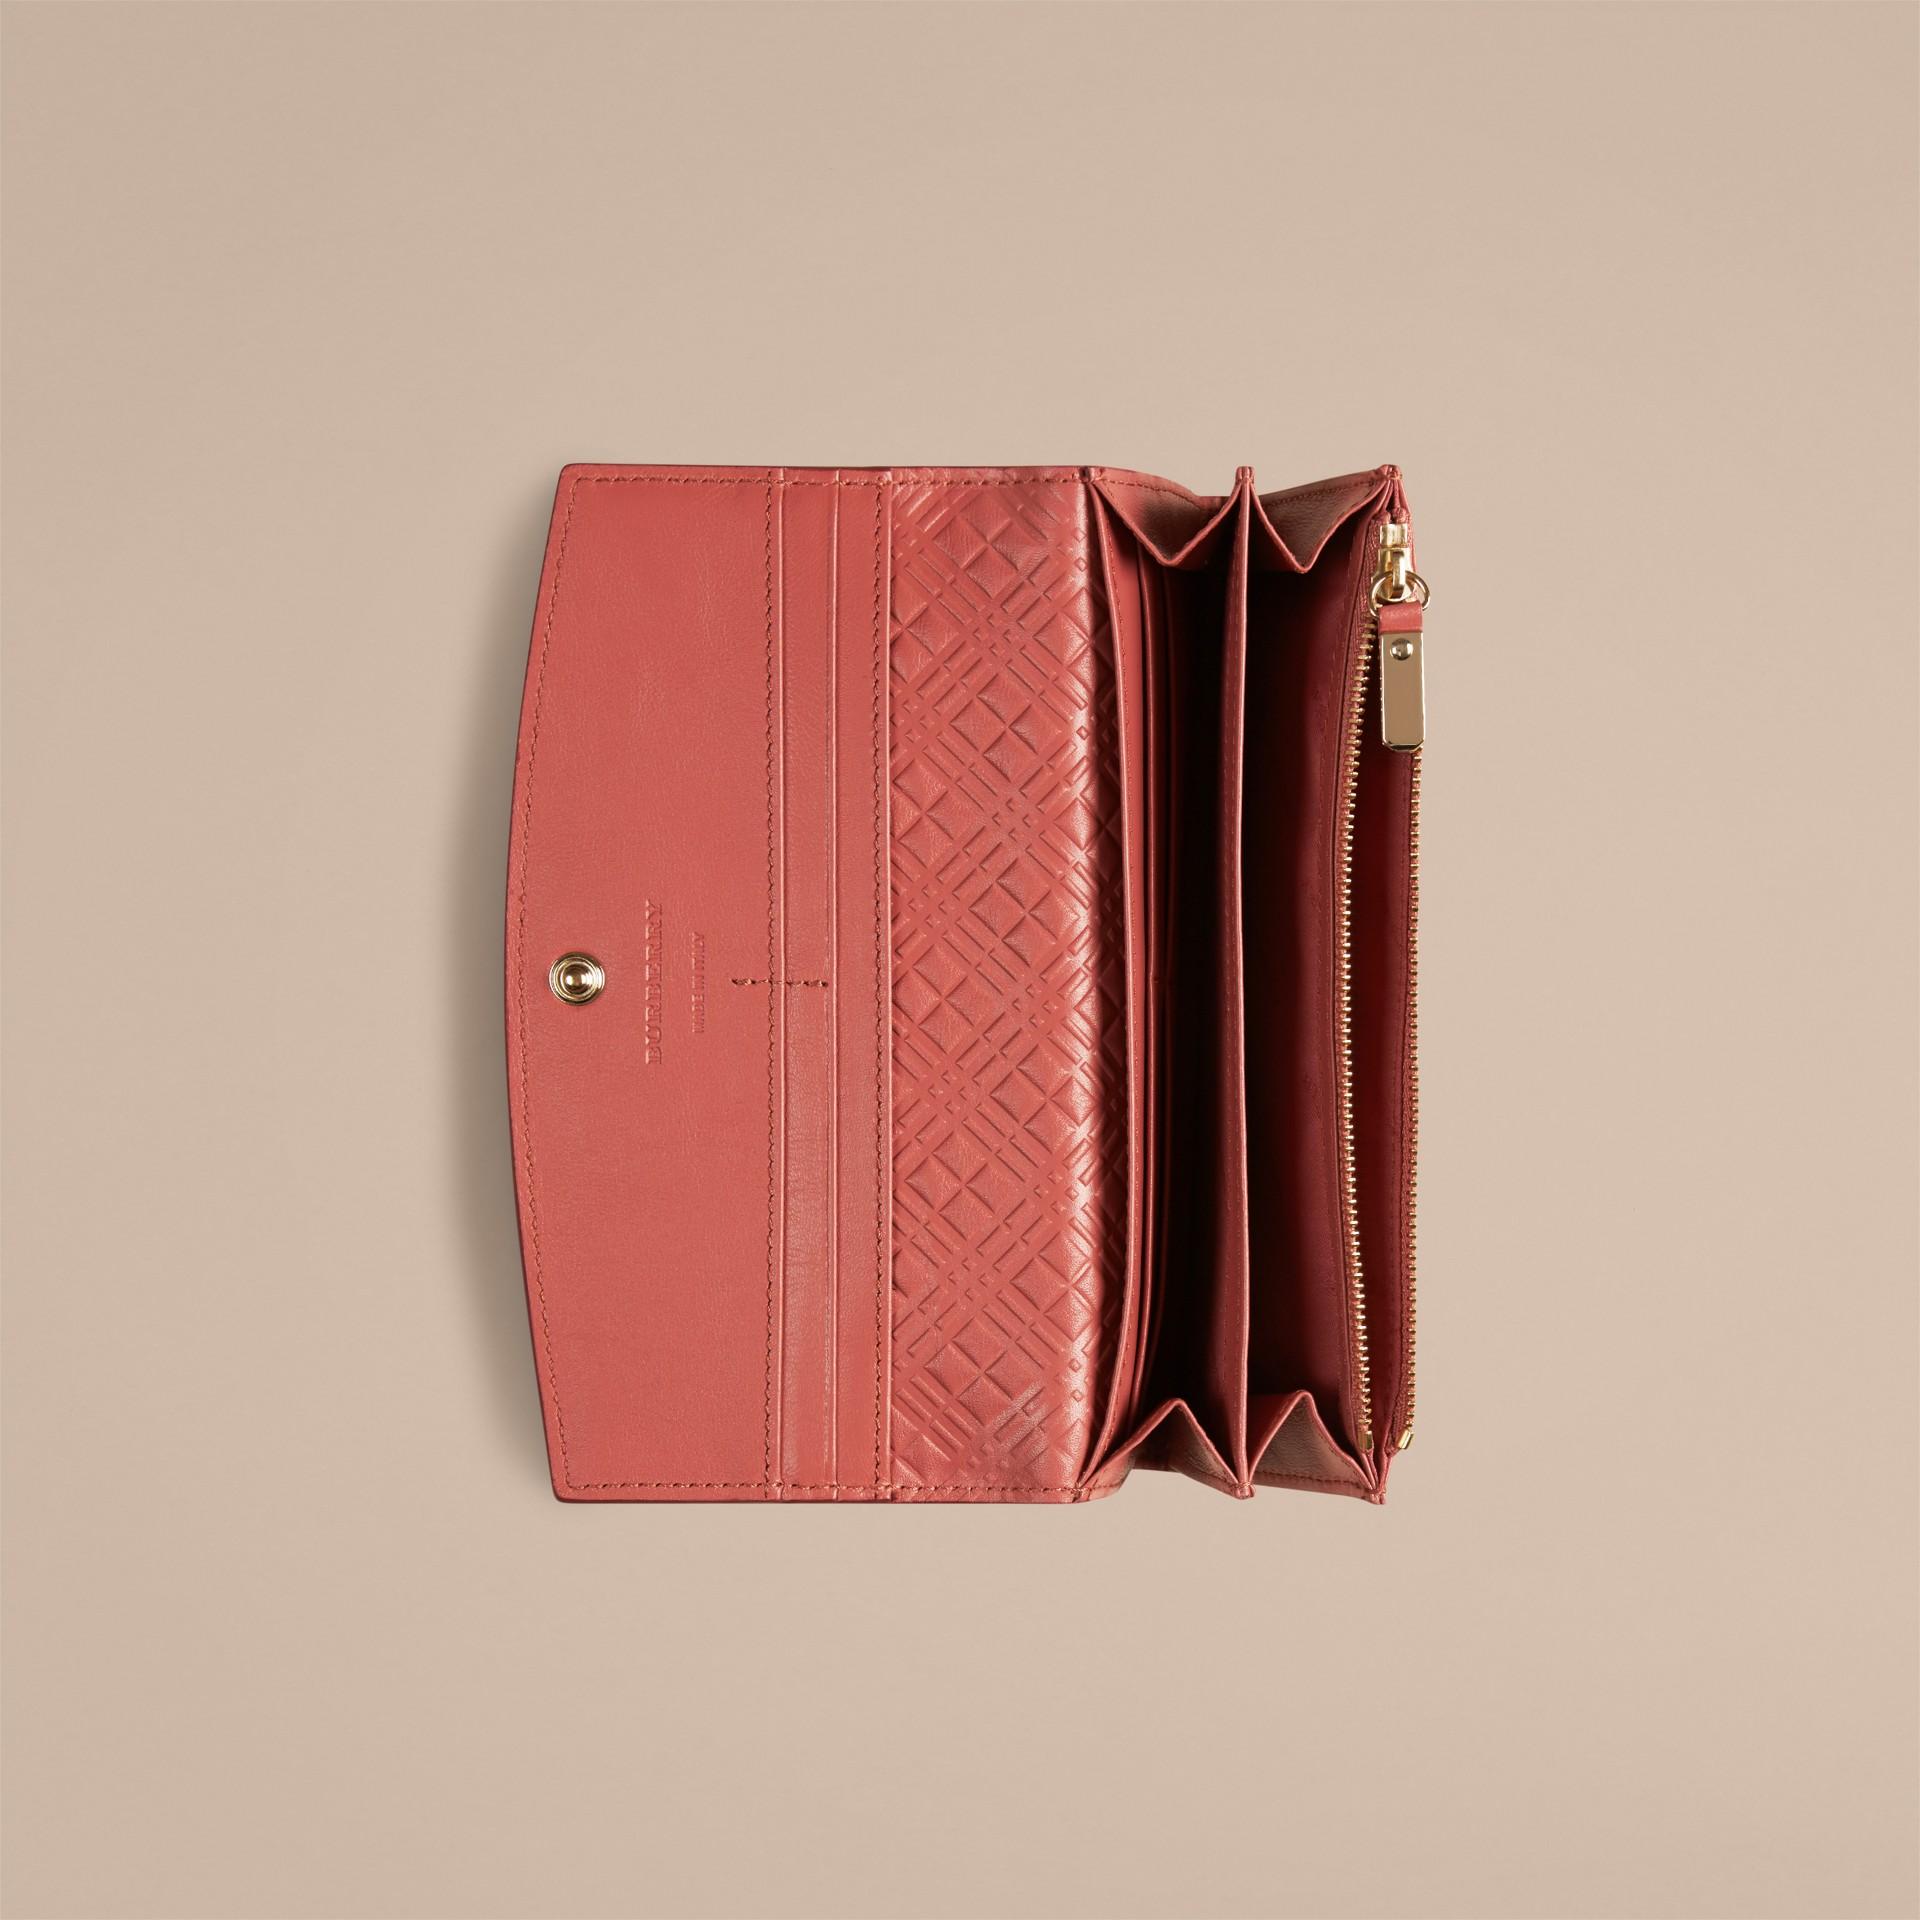 Antikrosa Brieftasche aus London-Lackleder im Kontinentalformat Antikrosa - Galerie-Bild 2